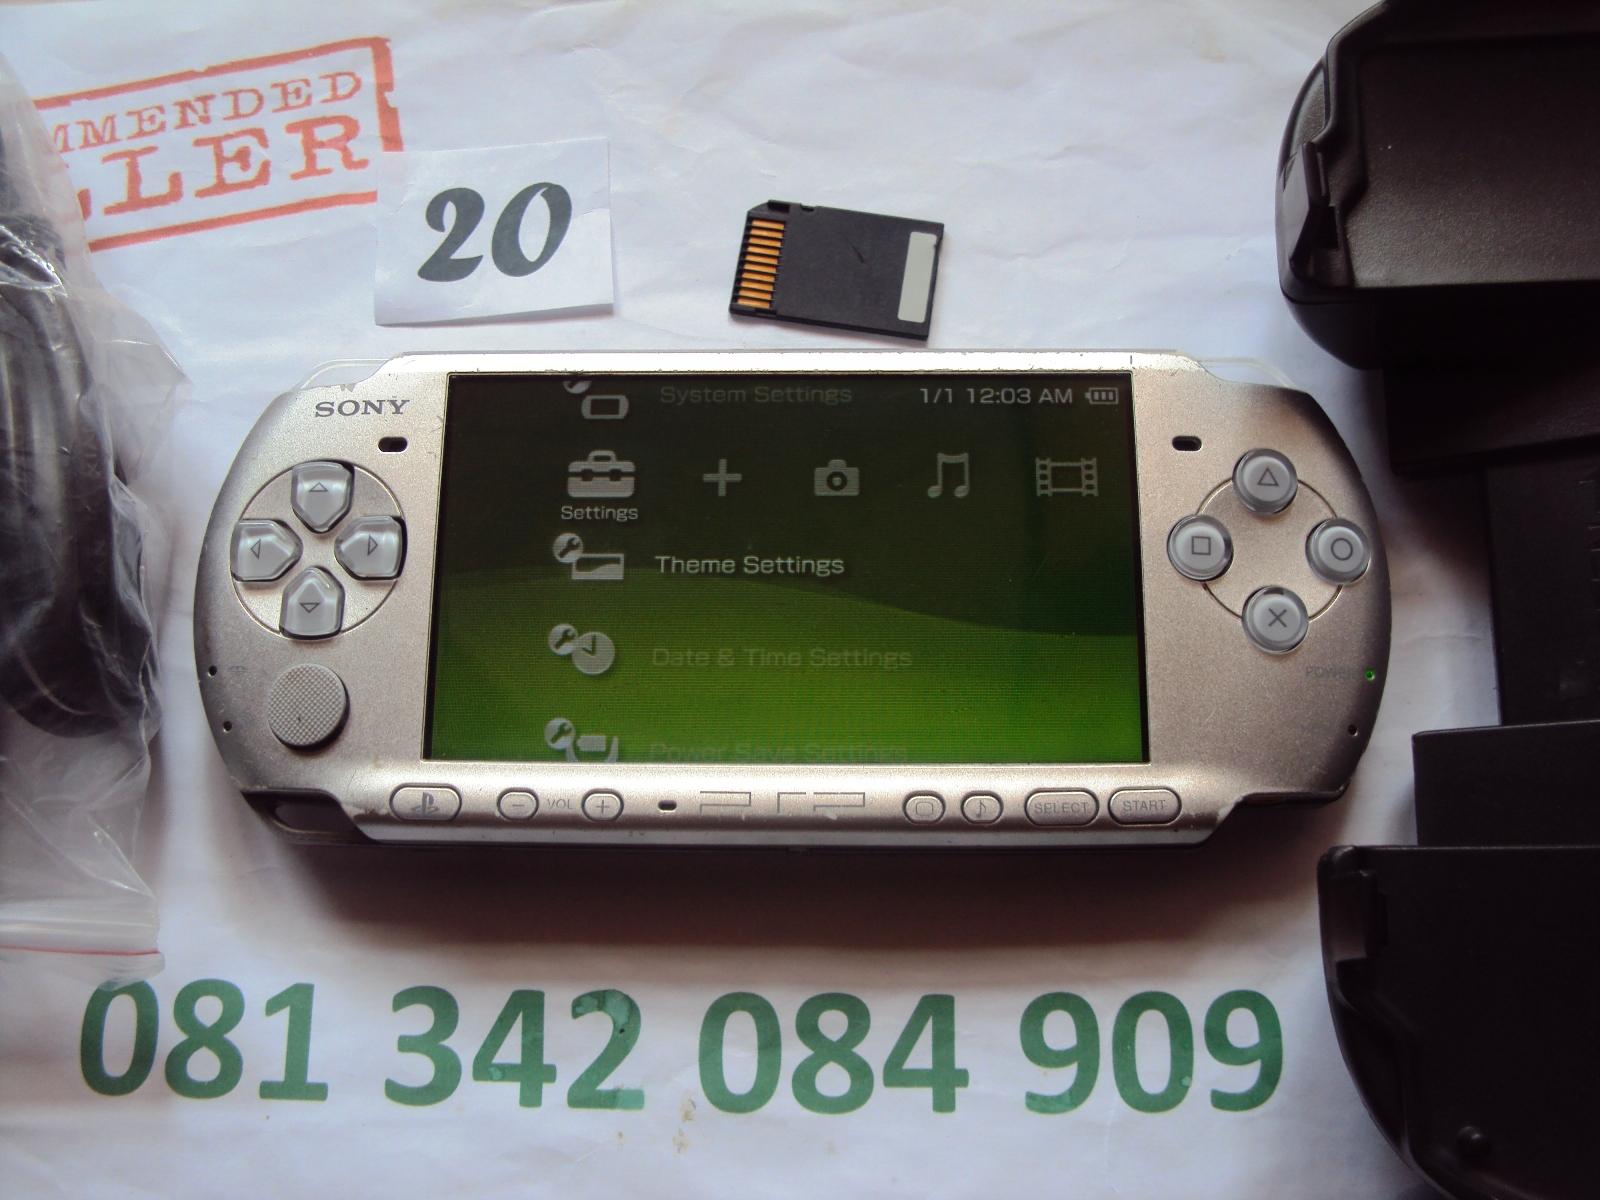 Sony psp 3001 firmware